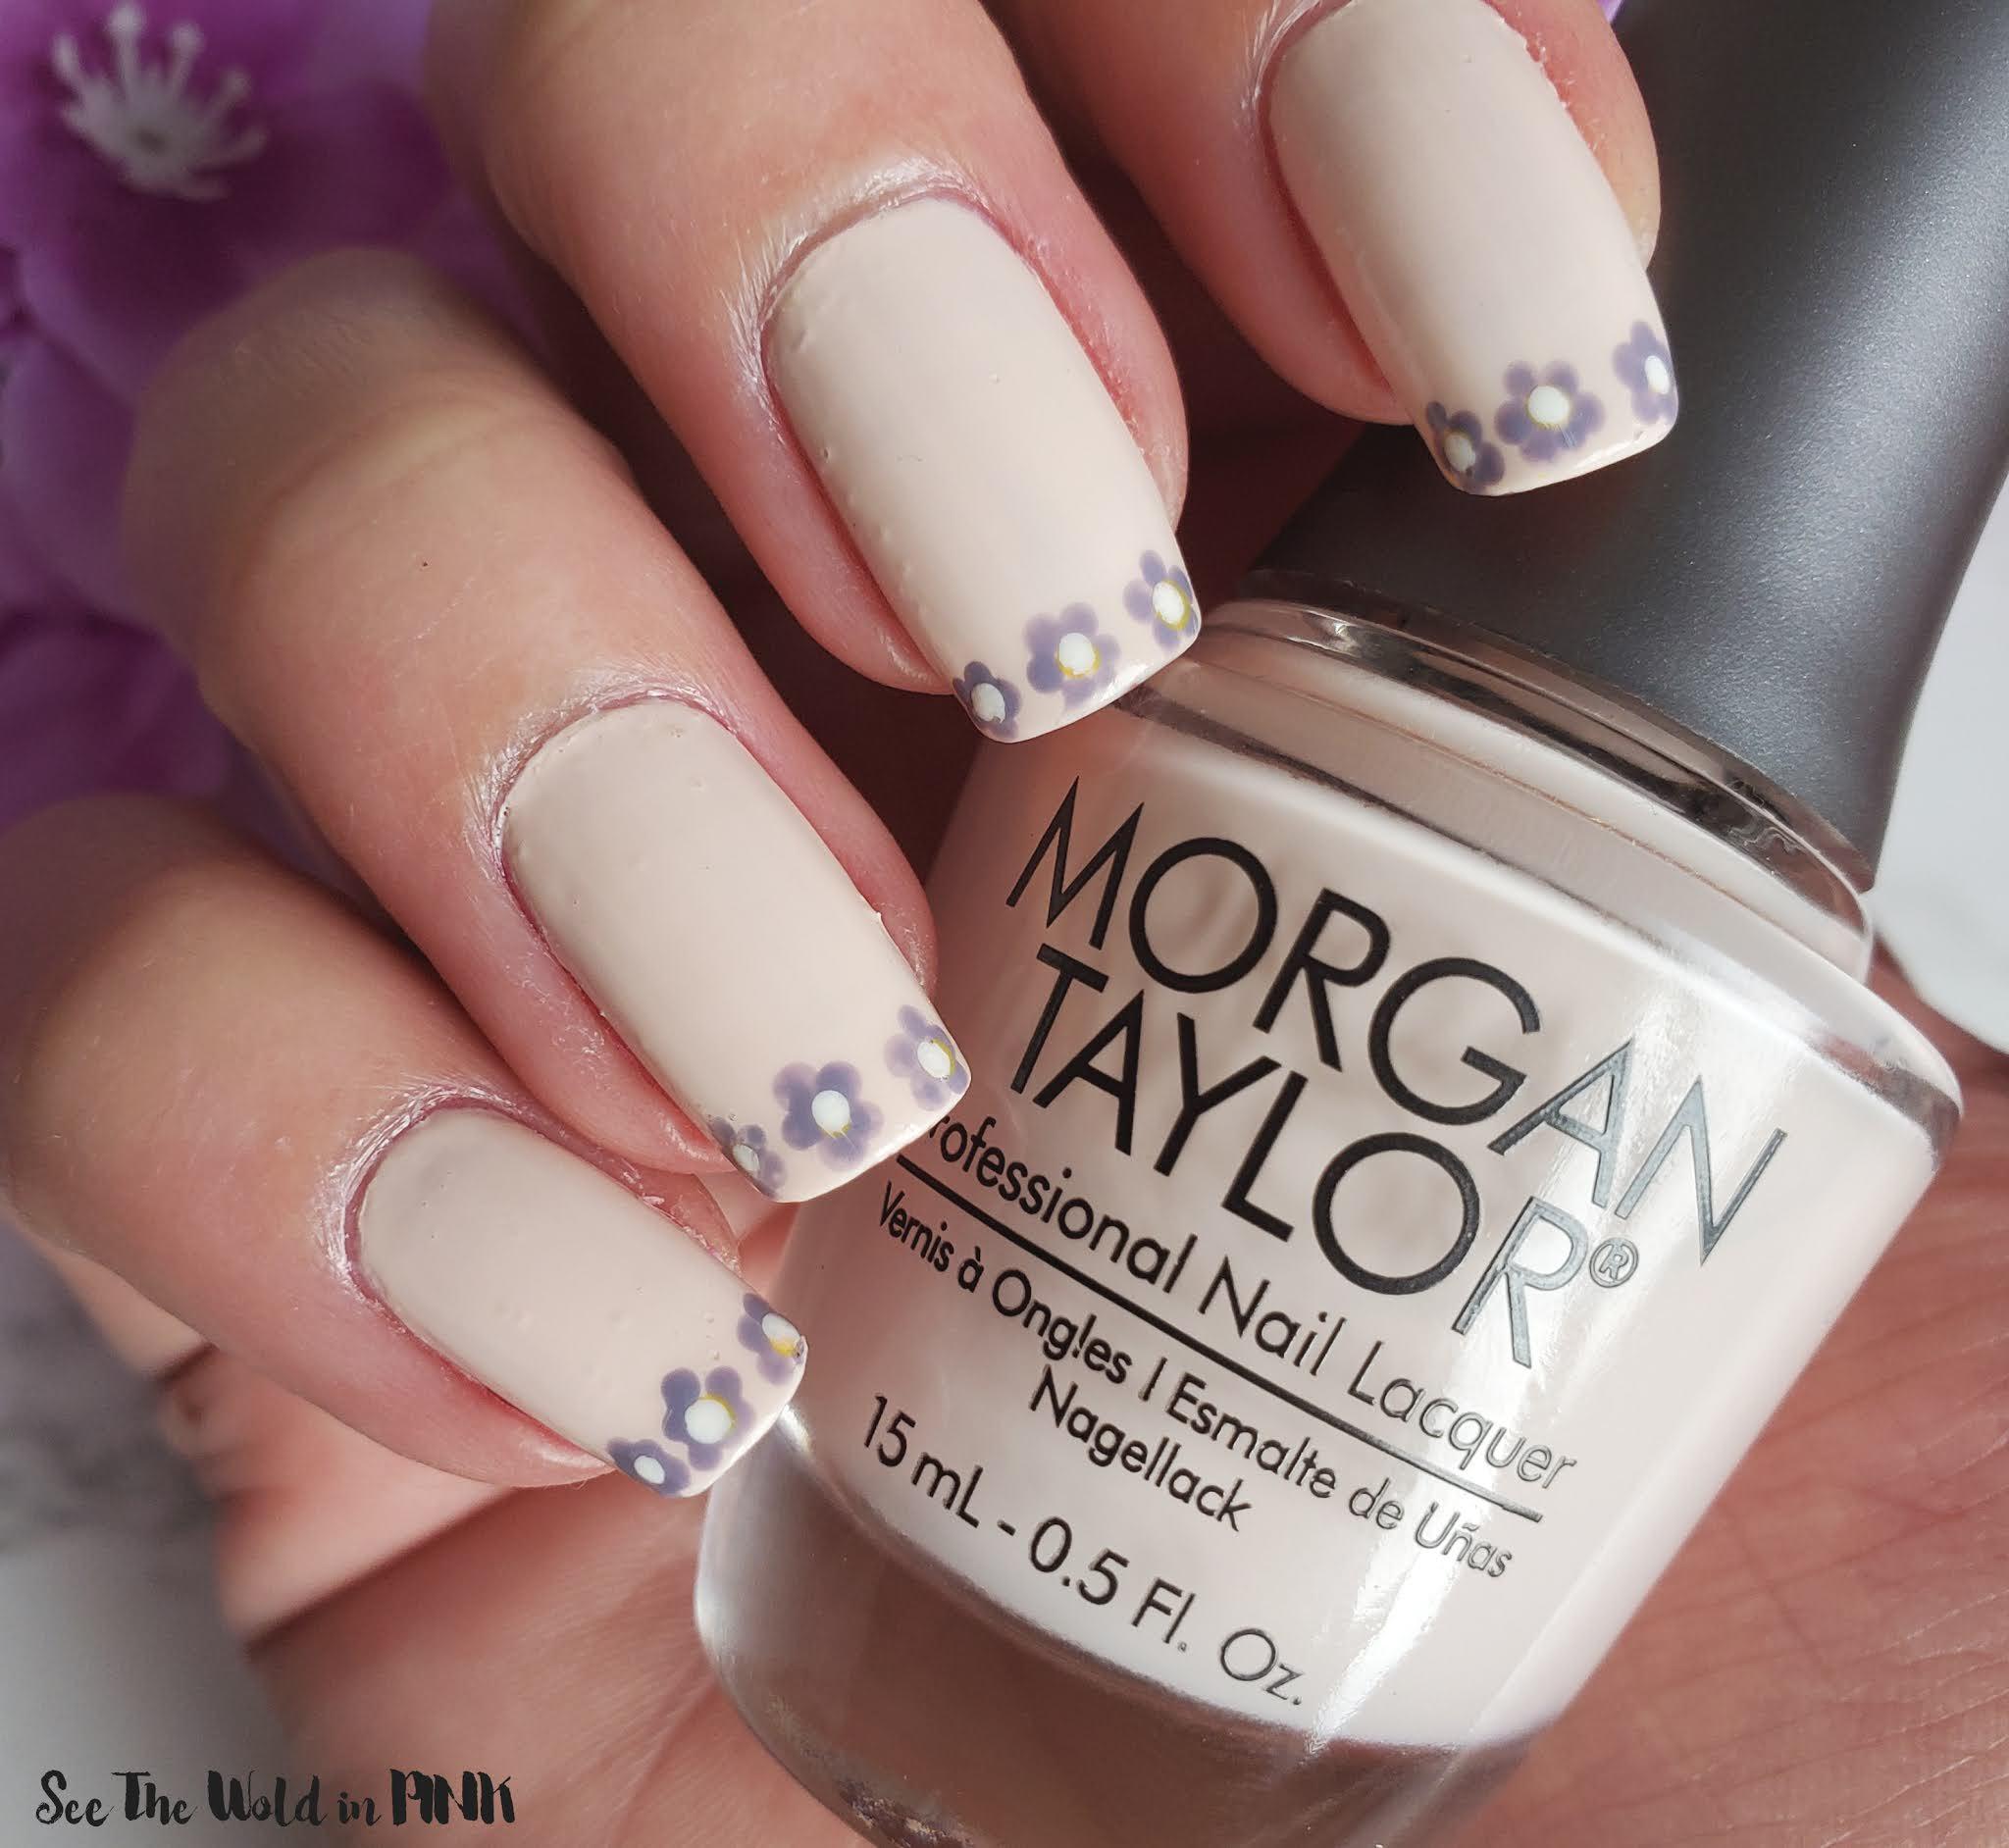 Manicure Monday - Flower French Mani Tips